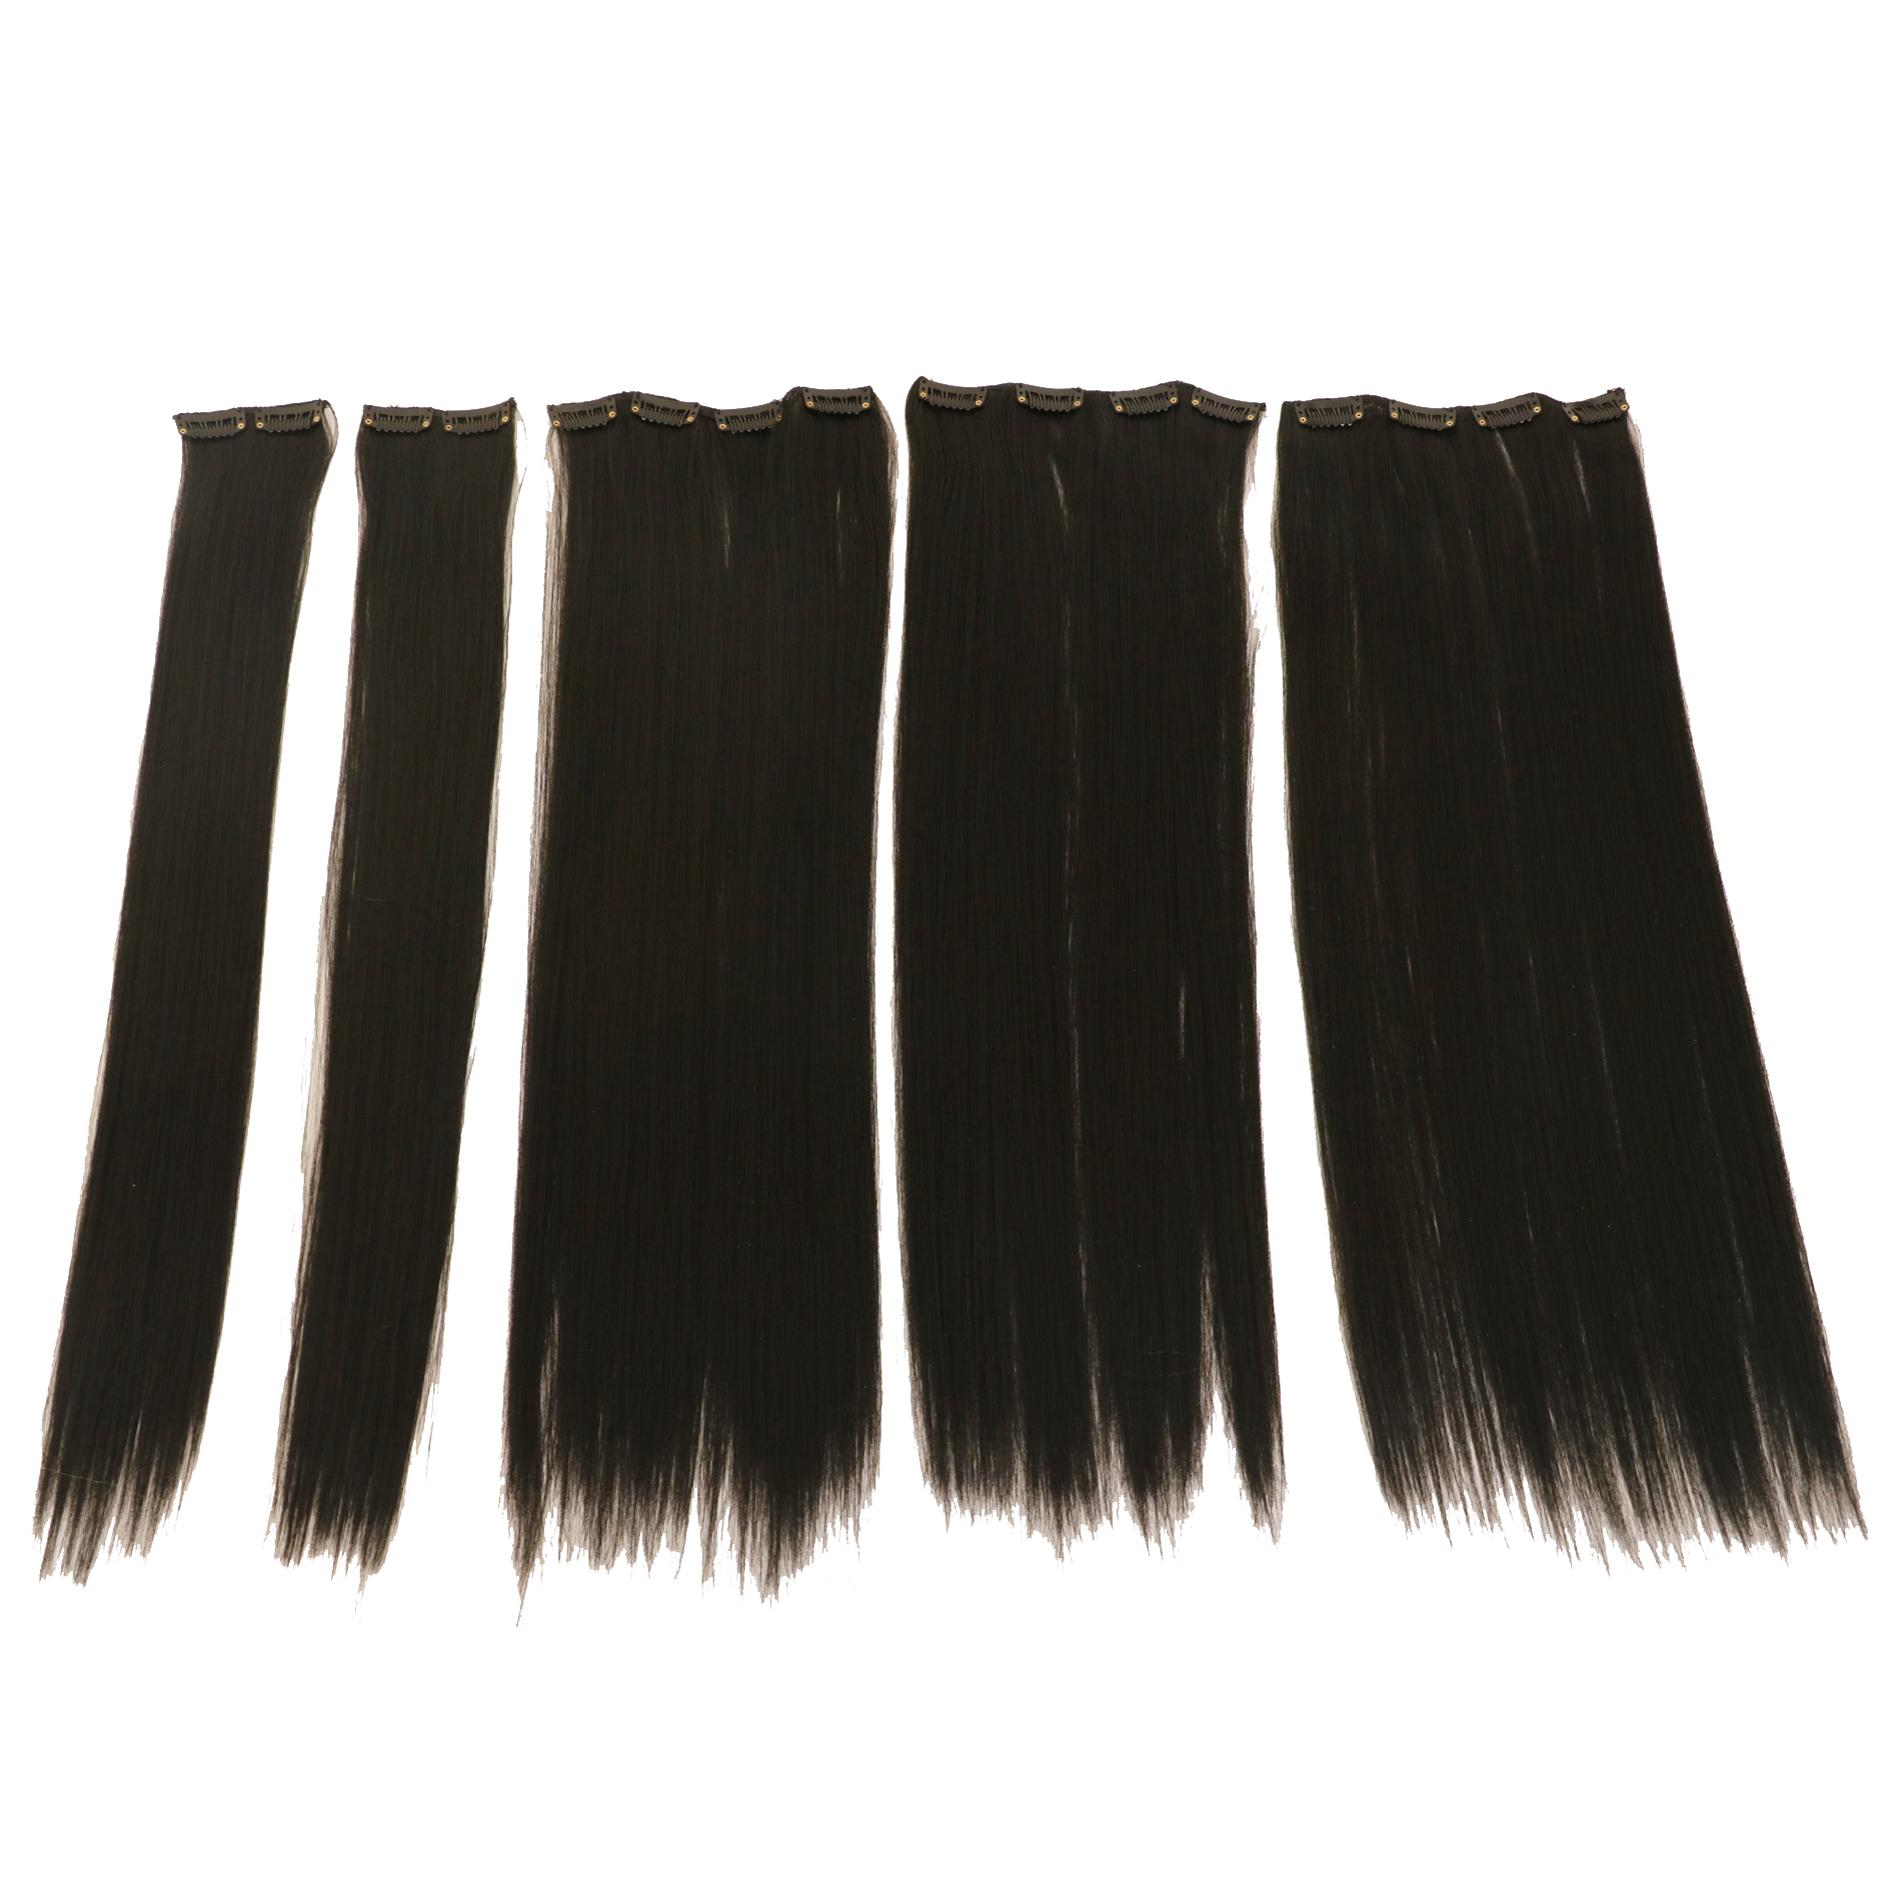 اکستنشن مو صاف اتو کشیده رنگ مشکی تیره کد stw20c-1